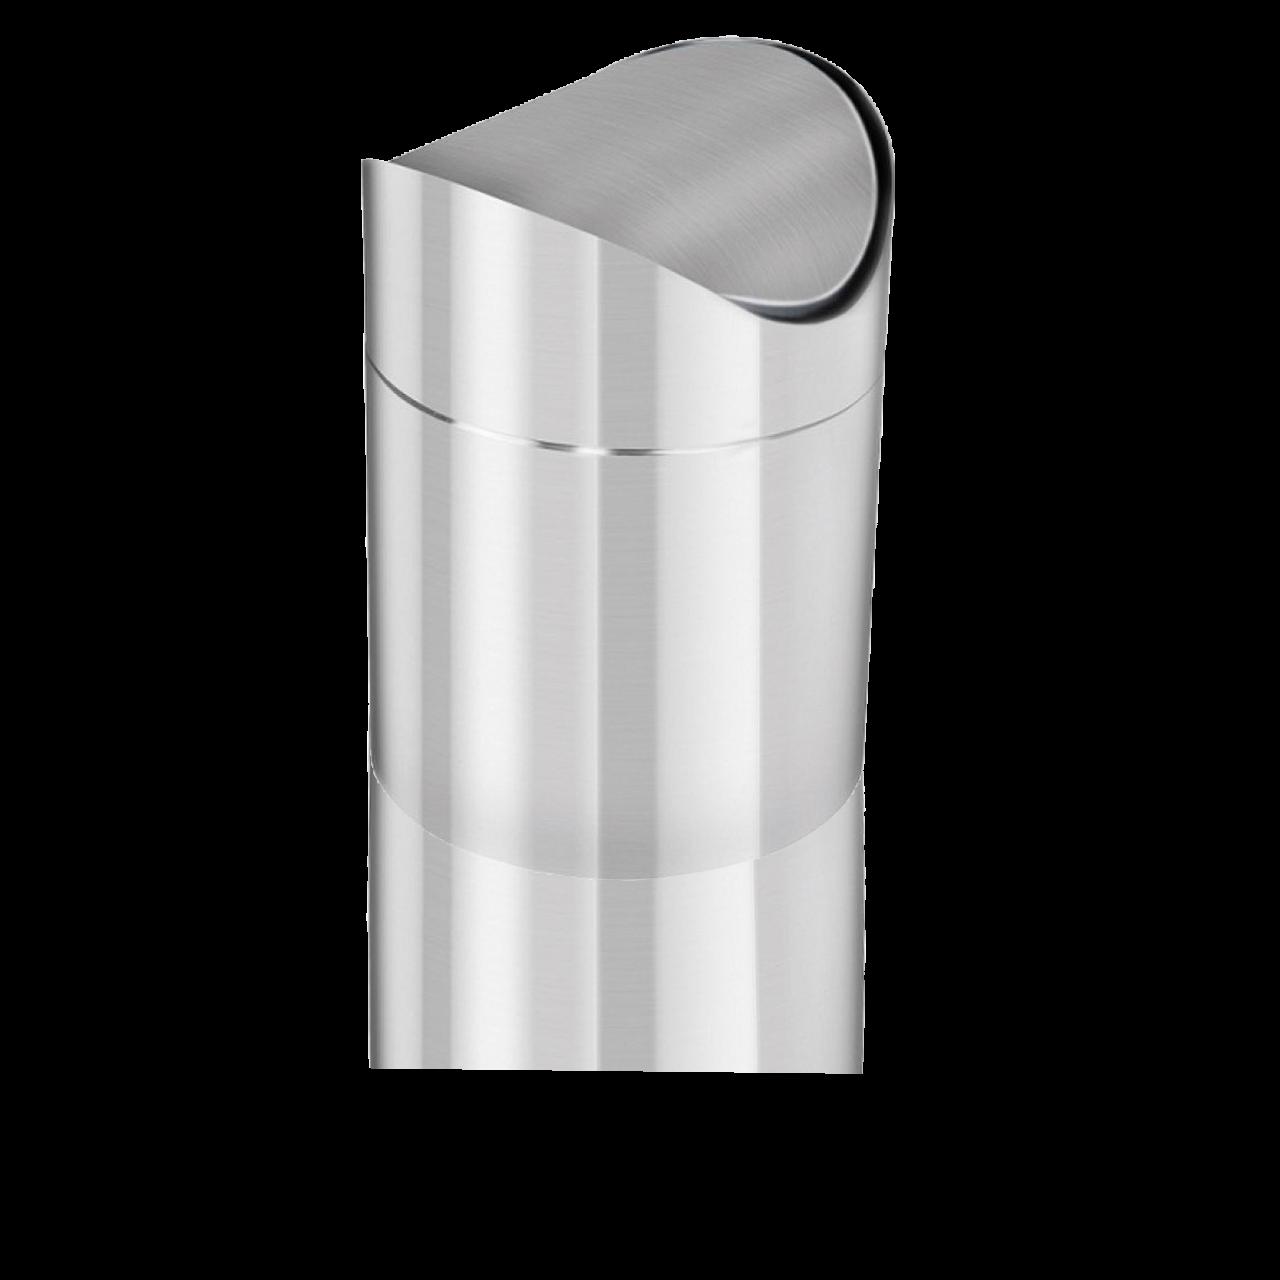 Abfallbehälter-Set f. Fußpflegeschränke